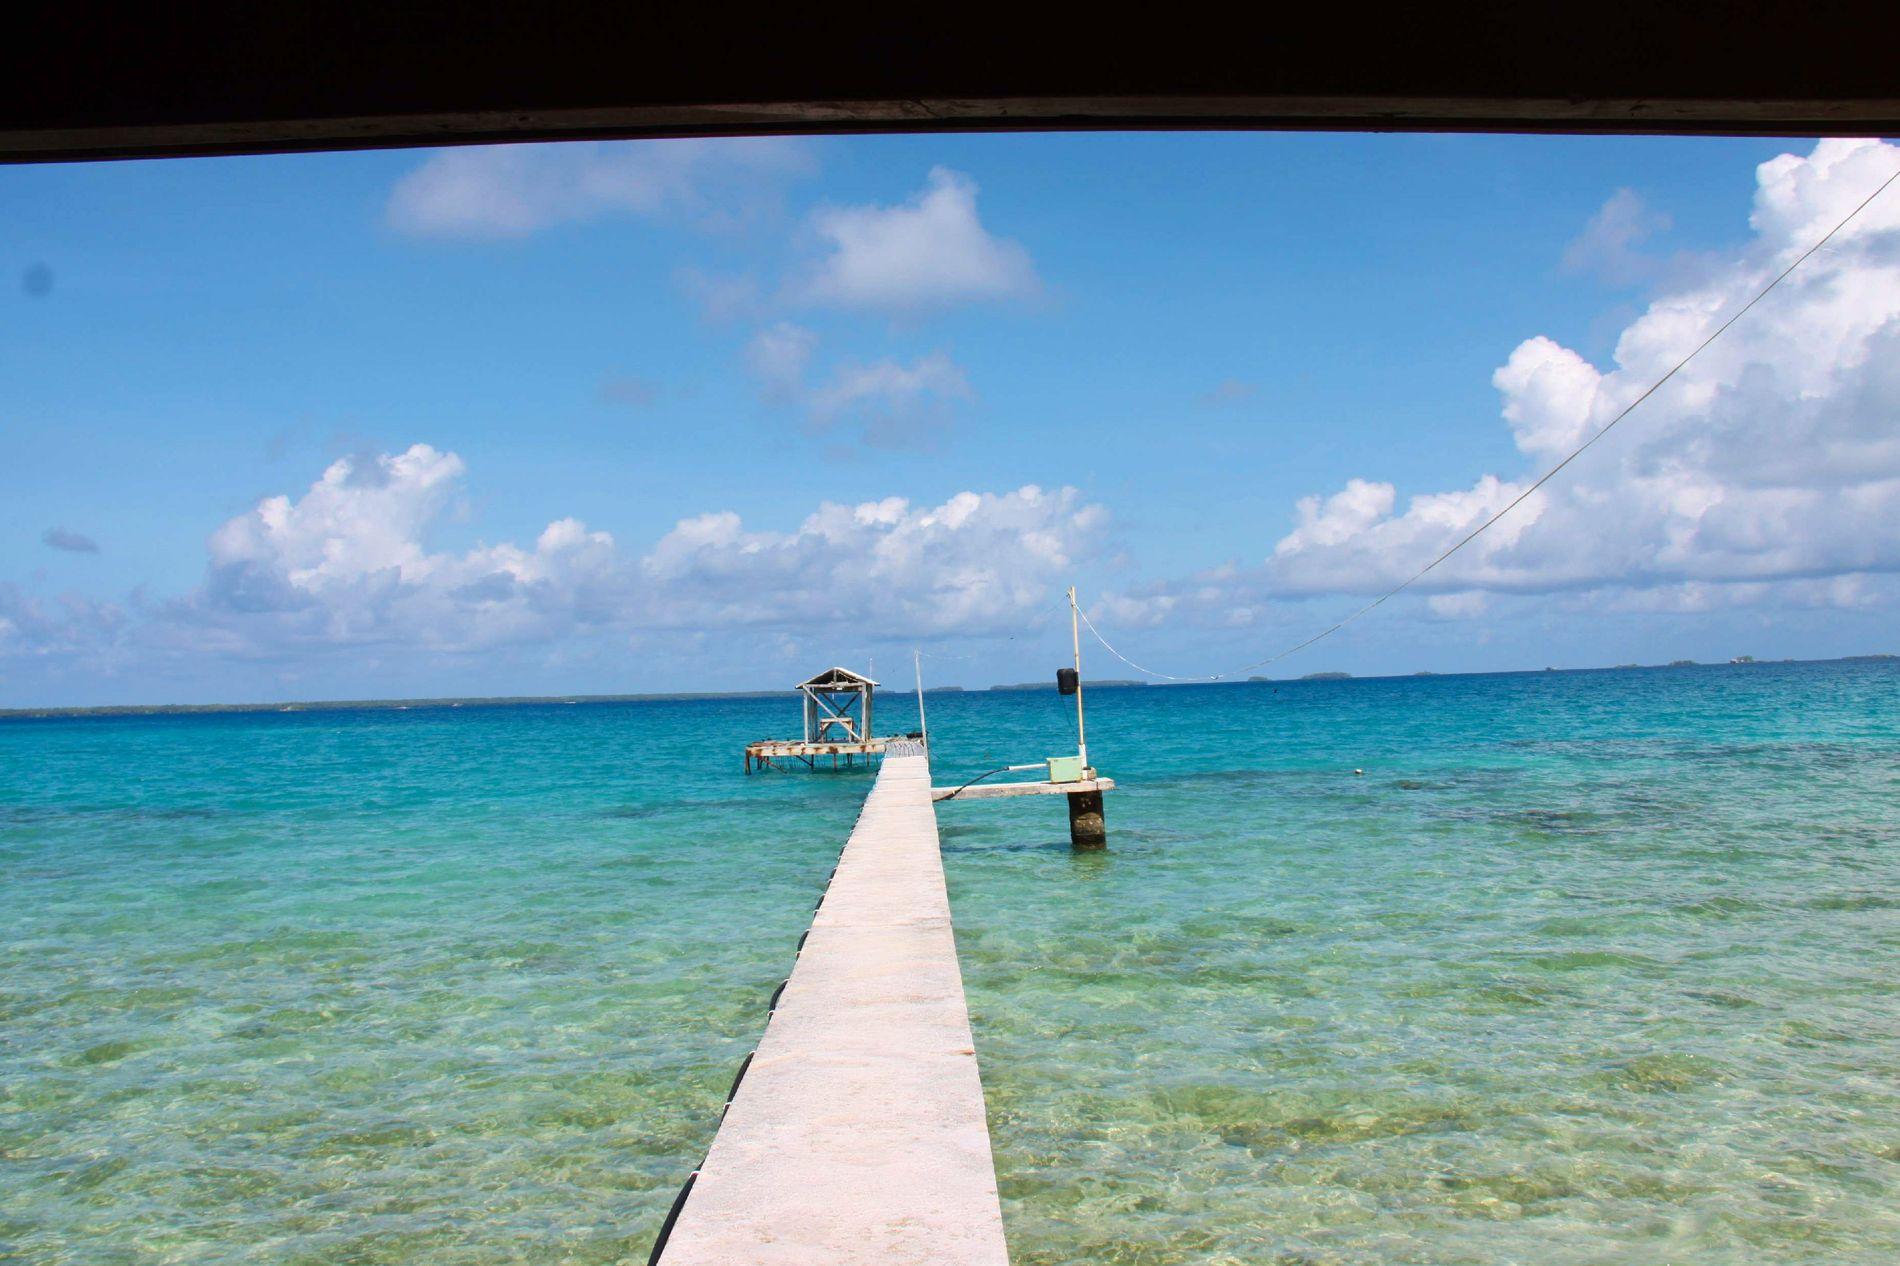 MARKLUNDS PARADIS: Med denne utsikten skrev Liza Marklund romanen «Perlefarmen» på stillehavsøyen Manihiki.